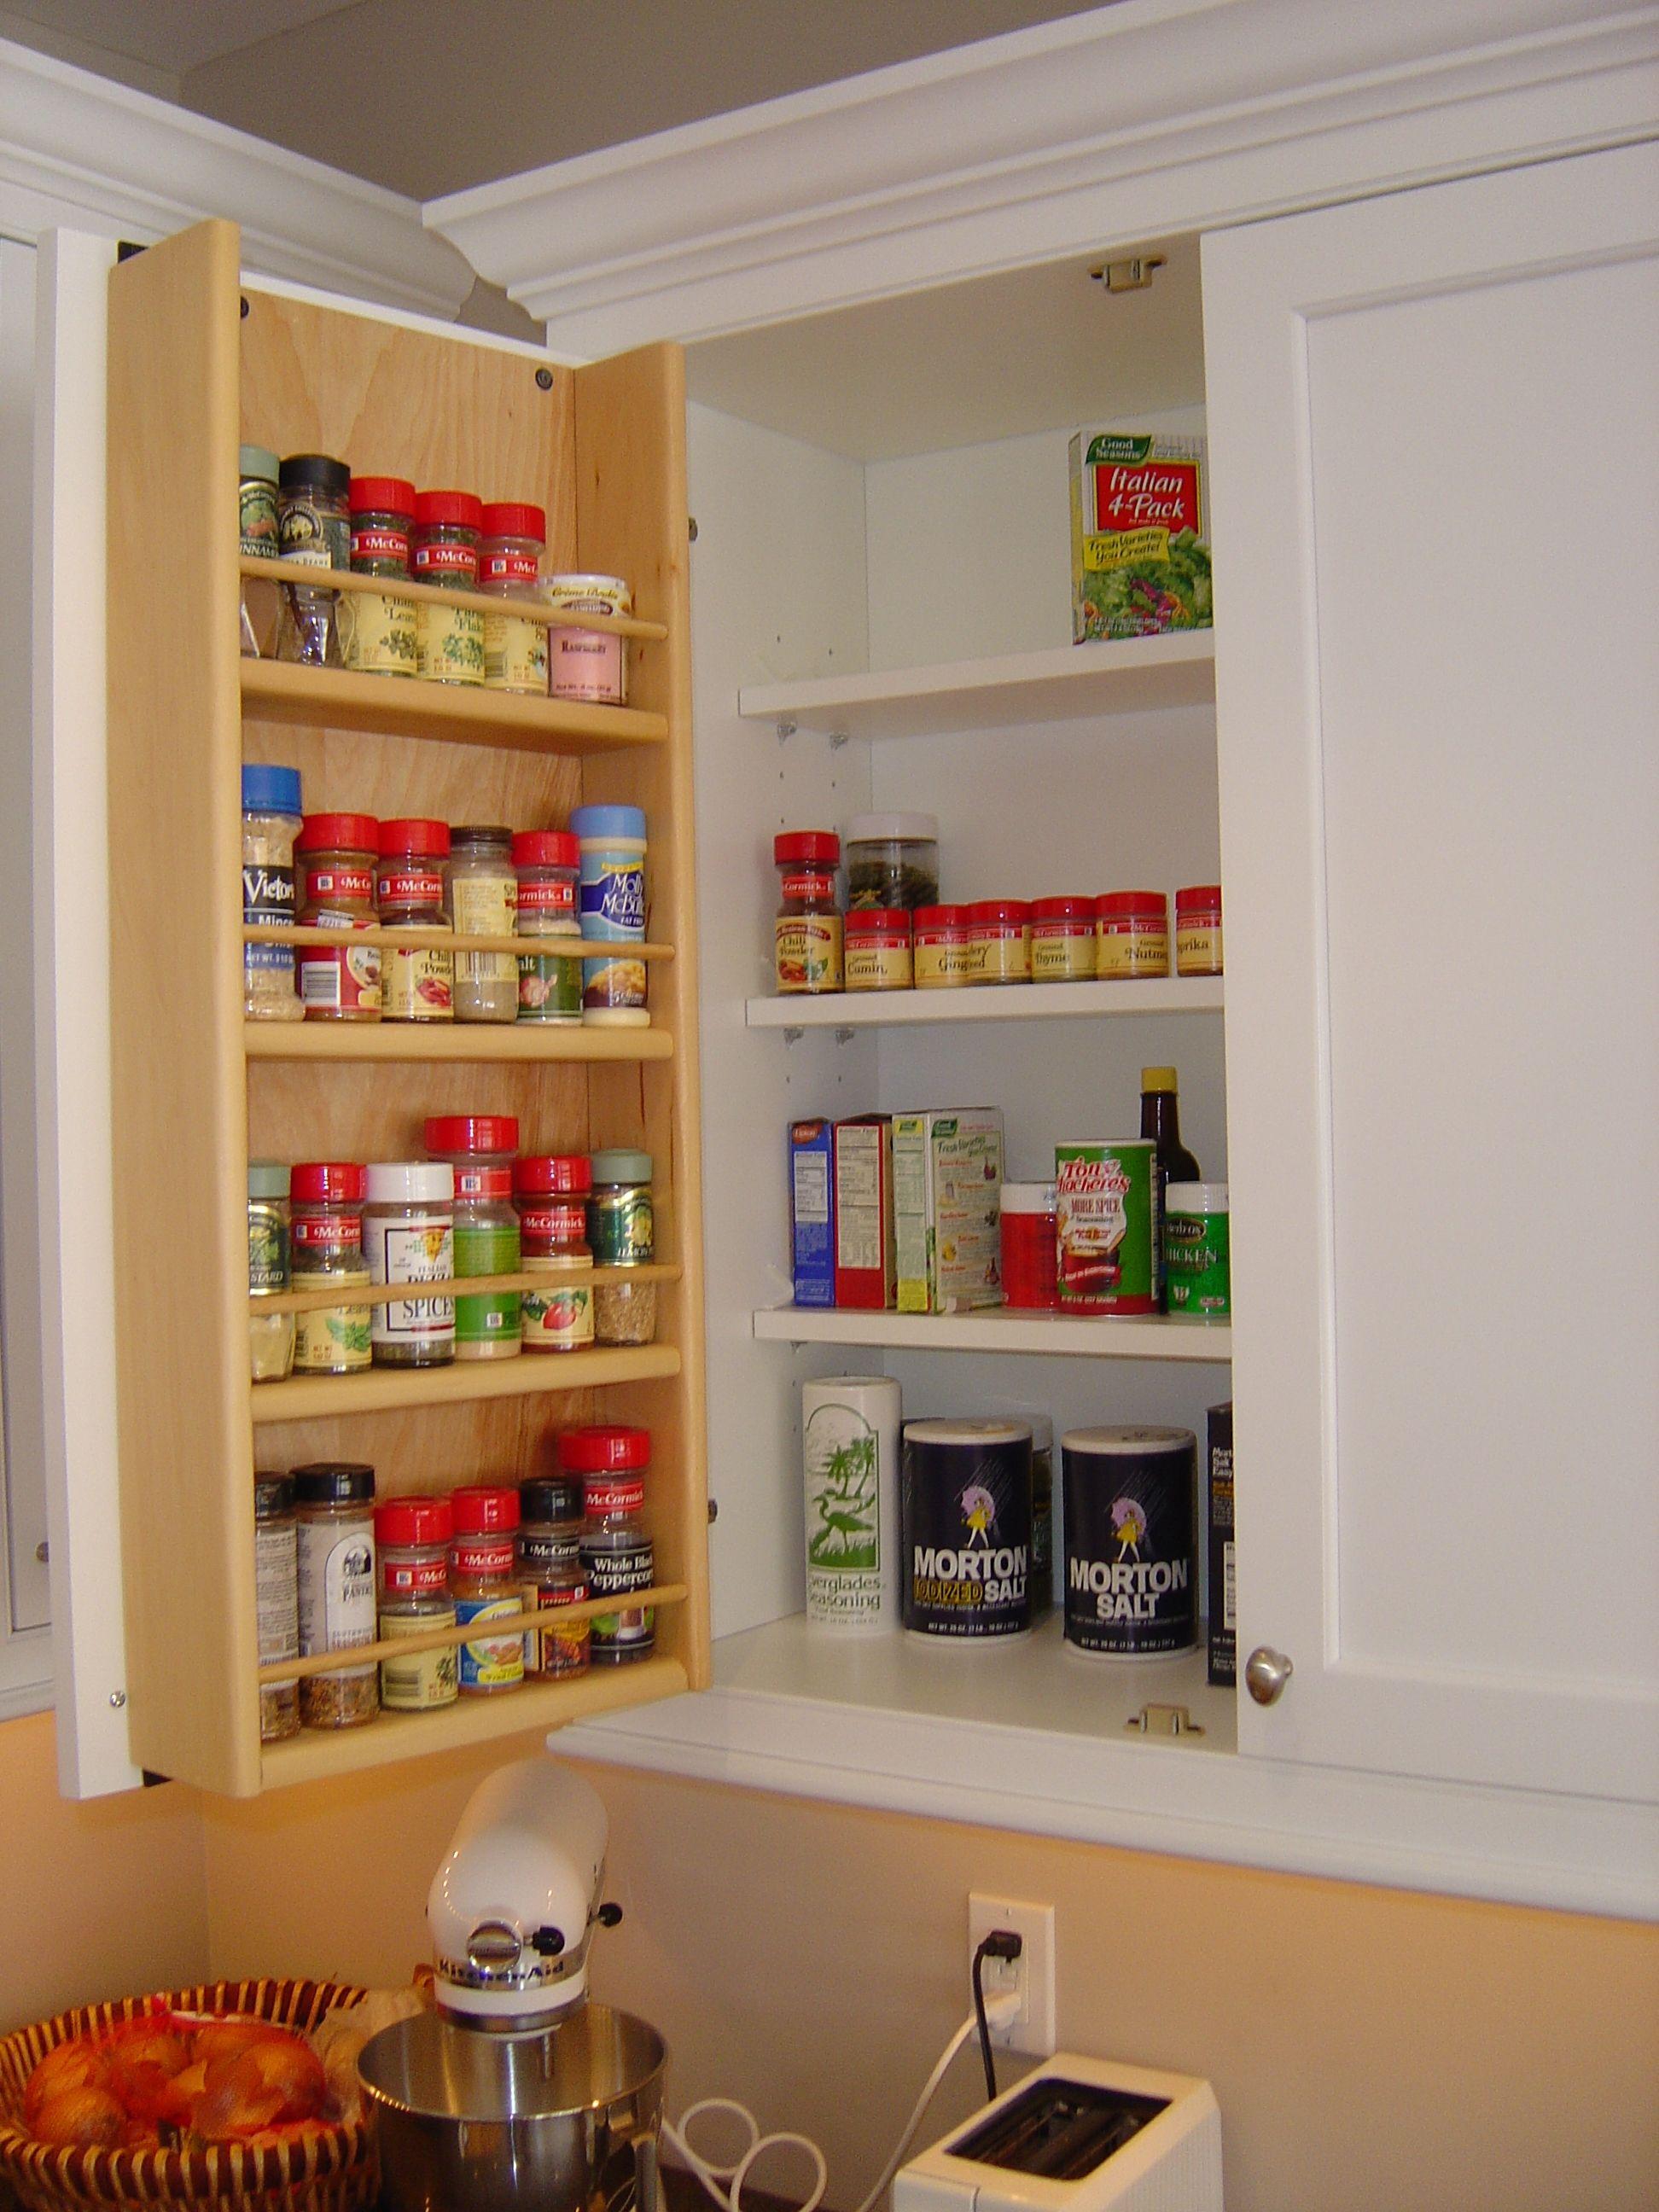 Tedd Wood Spice Storage On Inside Of Cabinet Door